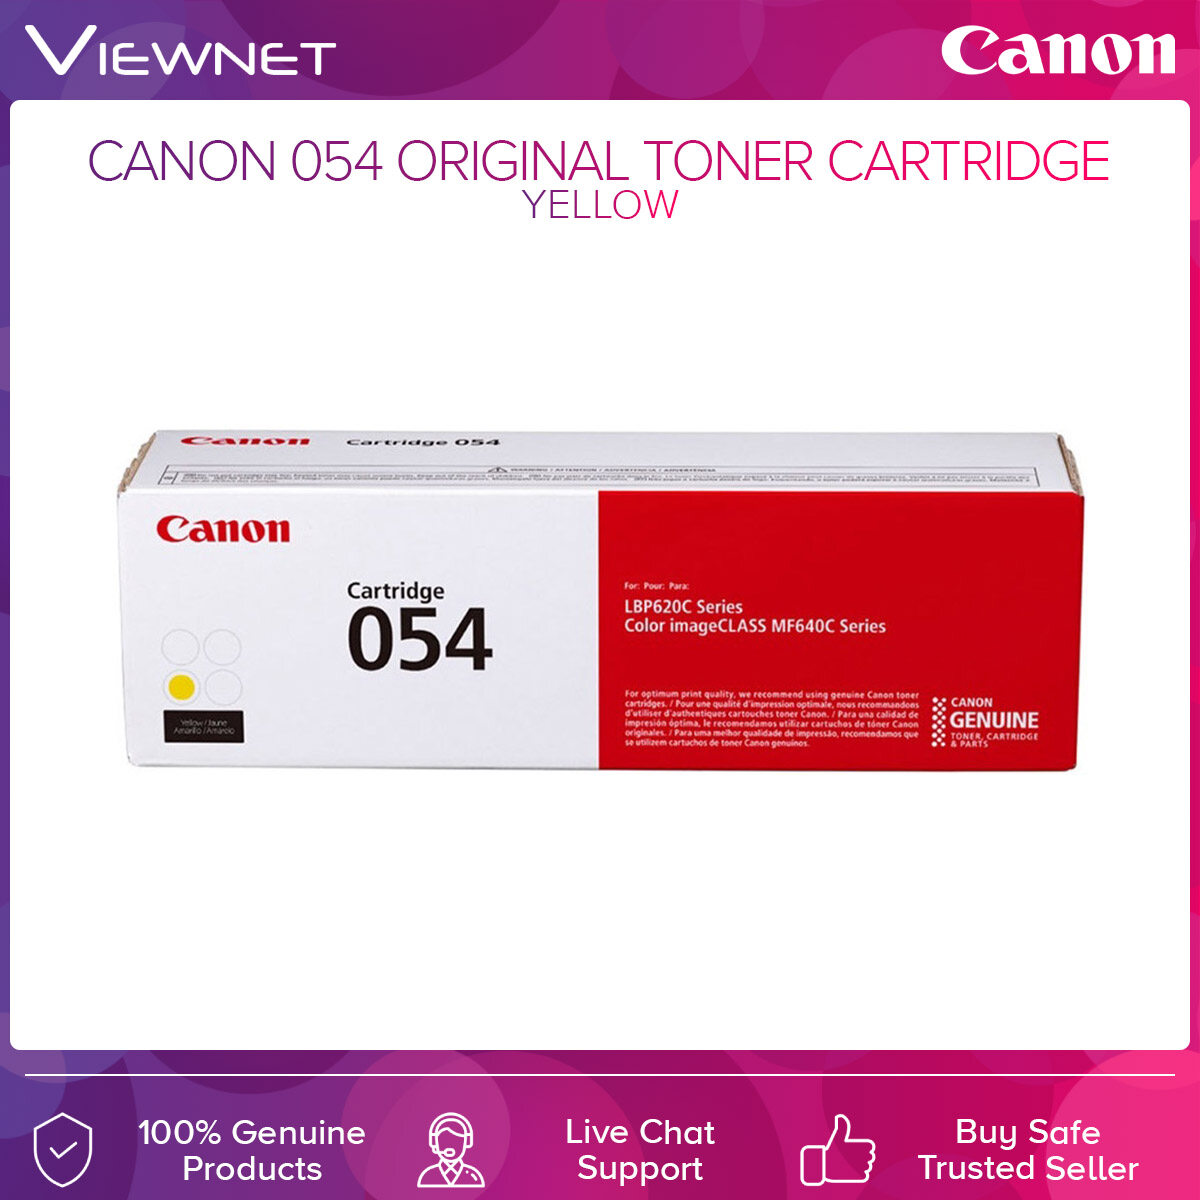 Canon 054 Original Toner Cartridge Black  Cyan  Magenta  Yellow